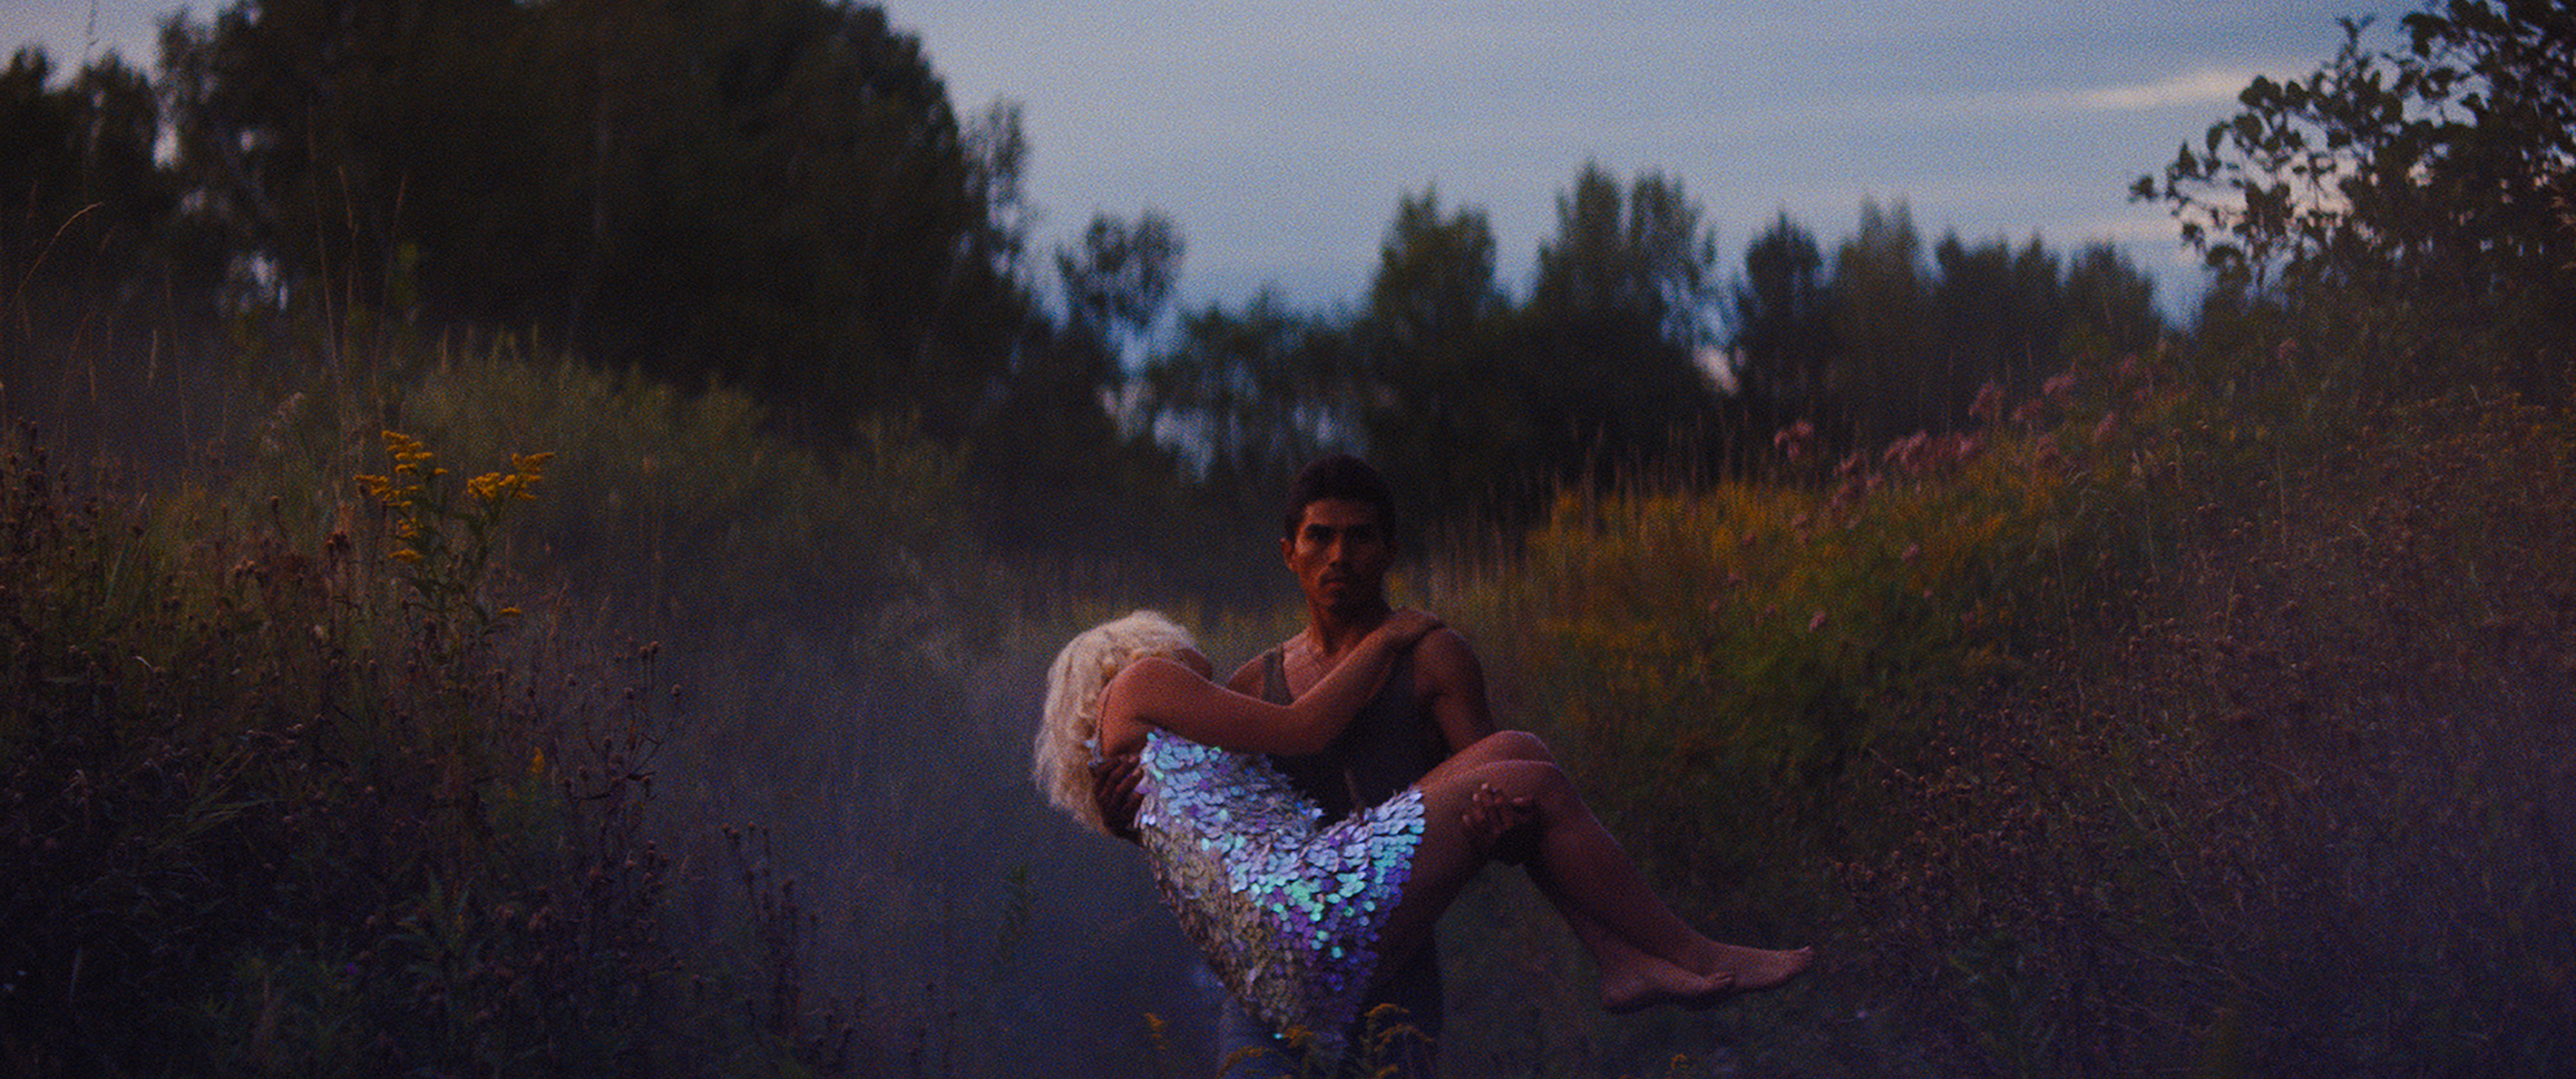 Jorge Antonio Guerrero in a grey tank top walks through a field of flowers, carrying a dazed woman wearing a short sequin dress.